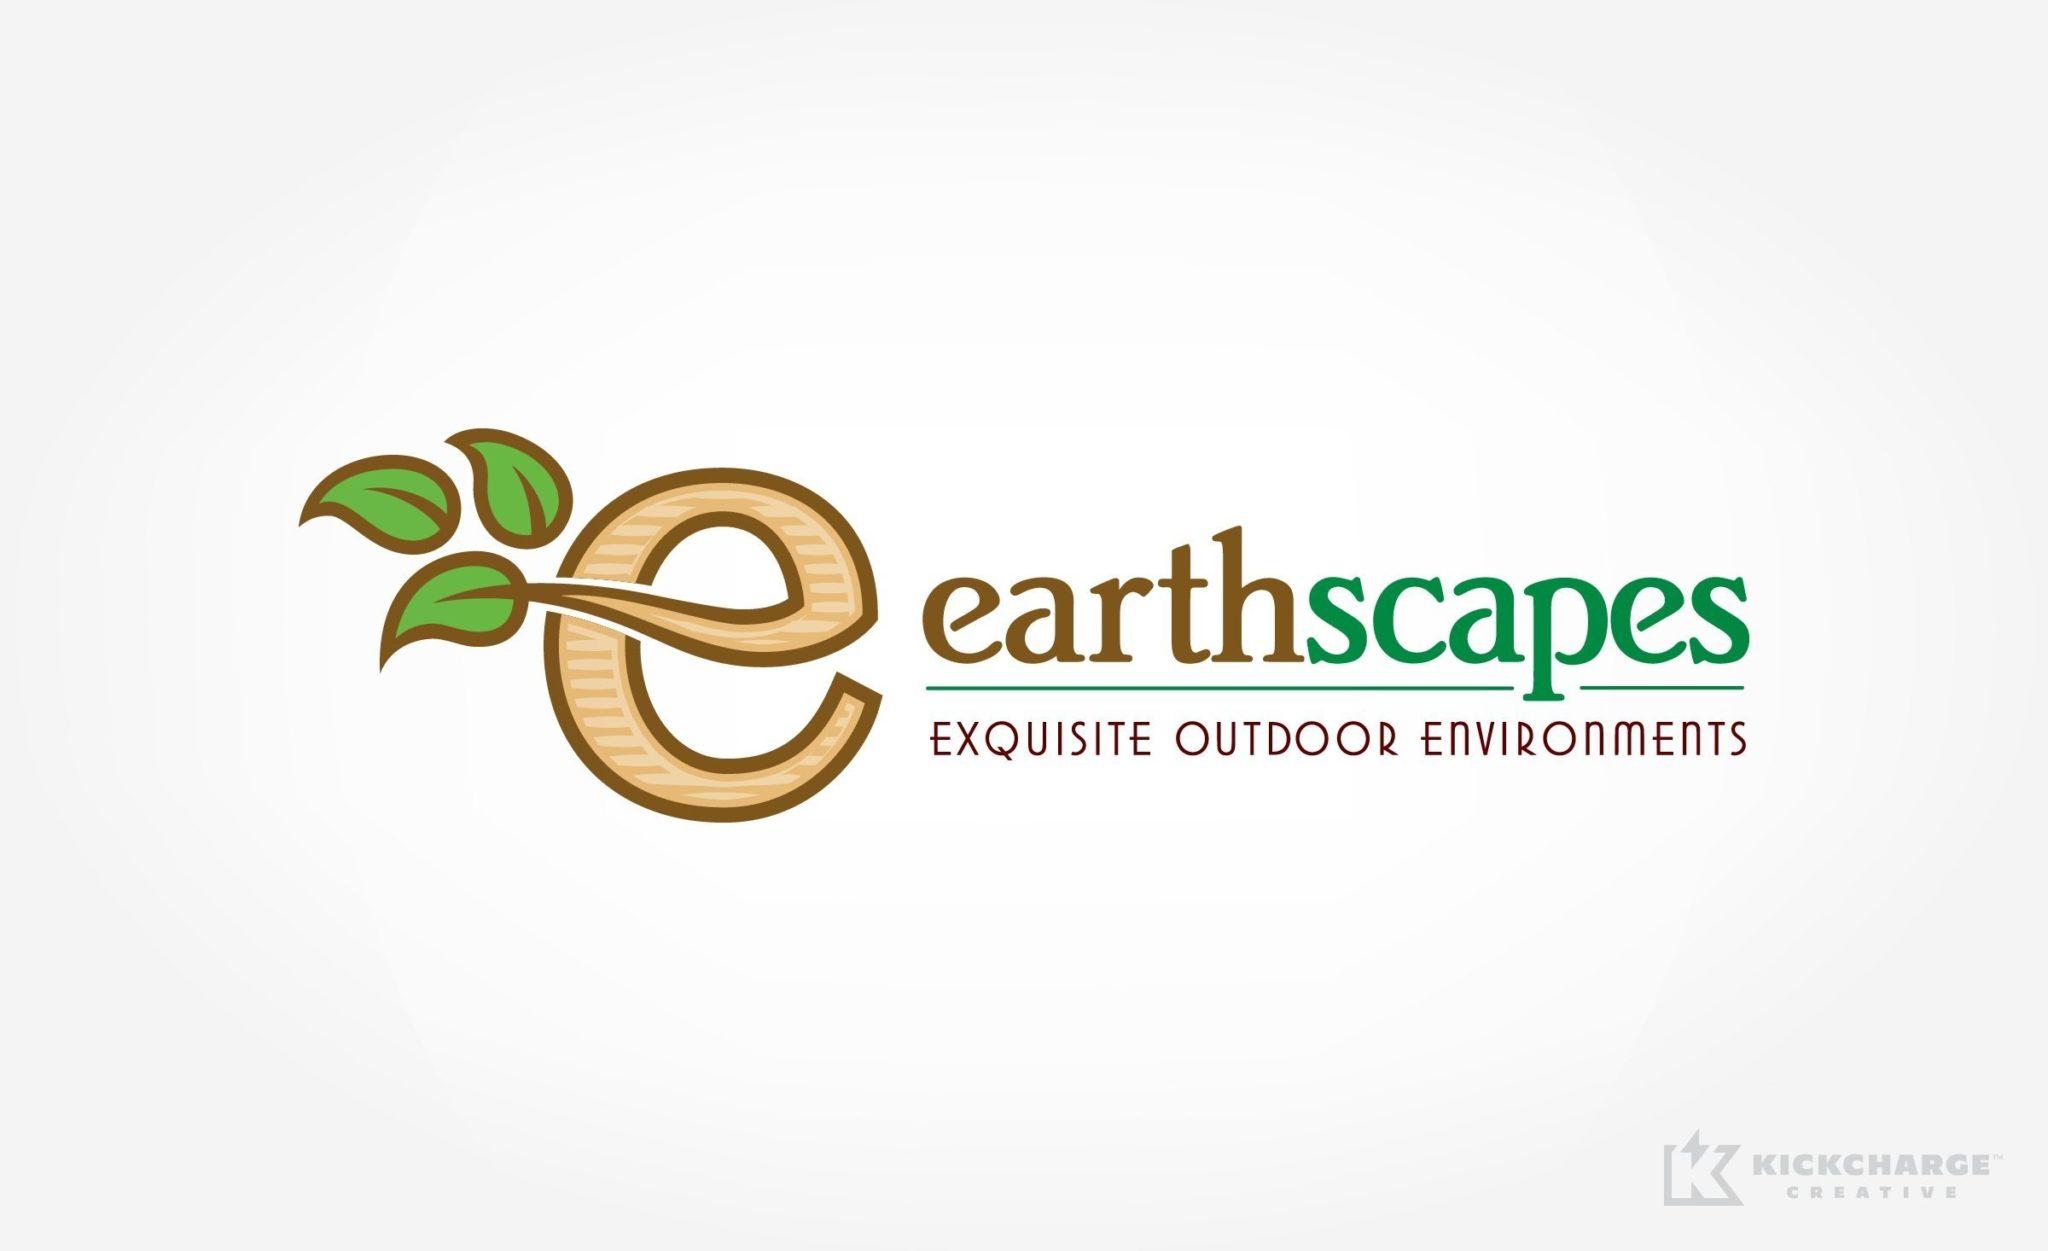 Landscaper logo design for property management firm in New Jersey.